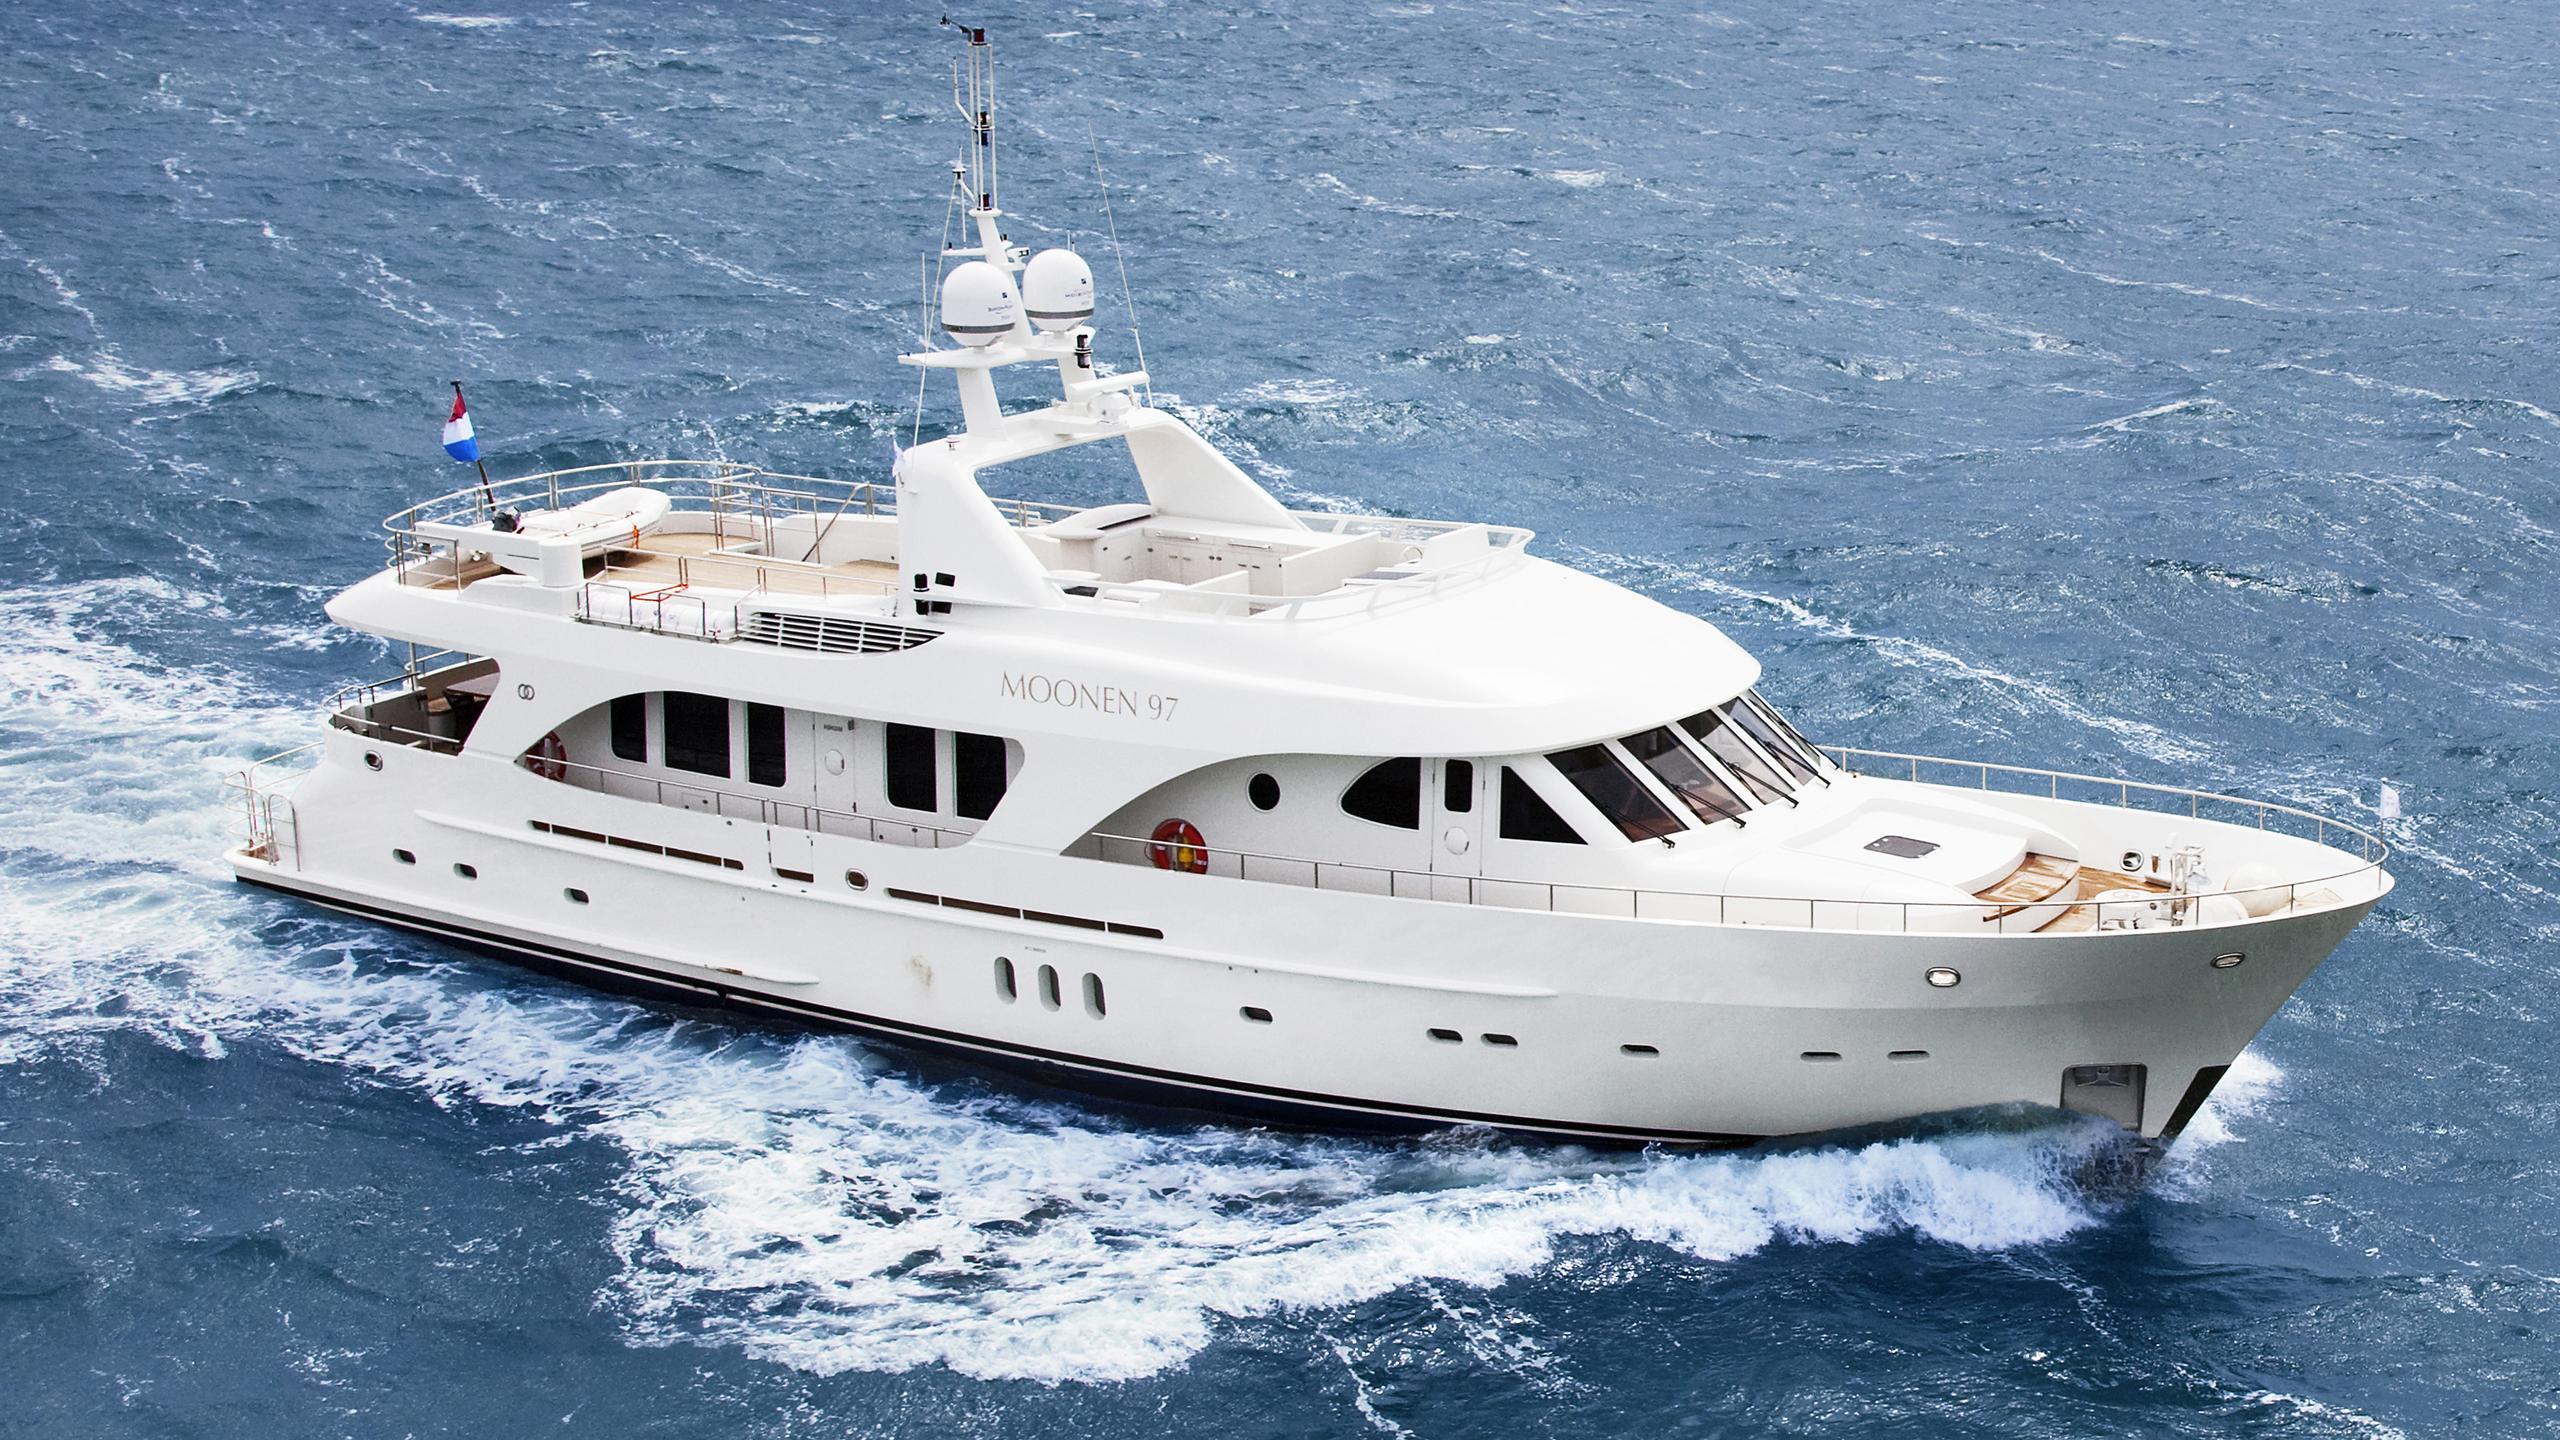 sofia-ii-yacht-cruising